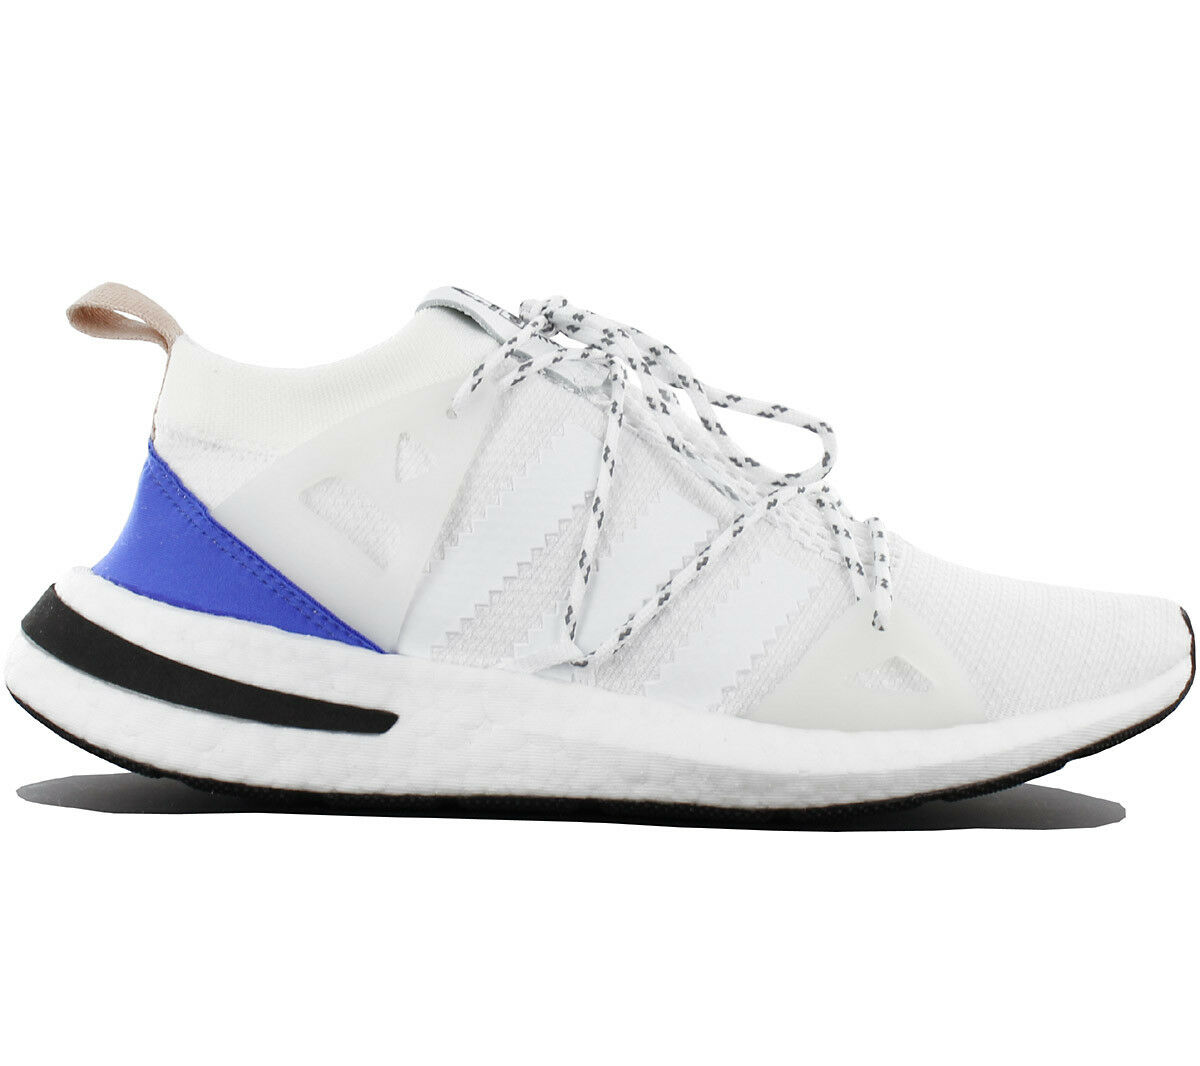 Adidas Originals arkyn w Boost mujer Trainers zapatos blanco CQ2748 zapatillas NEW